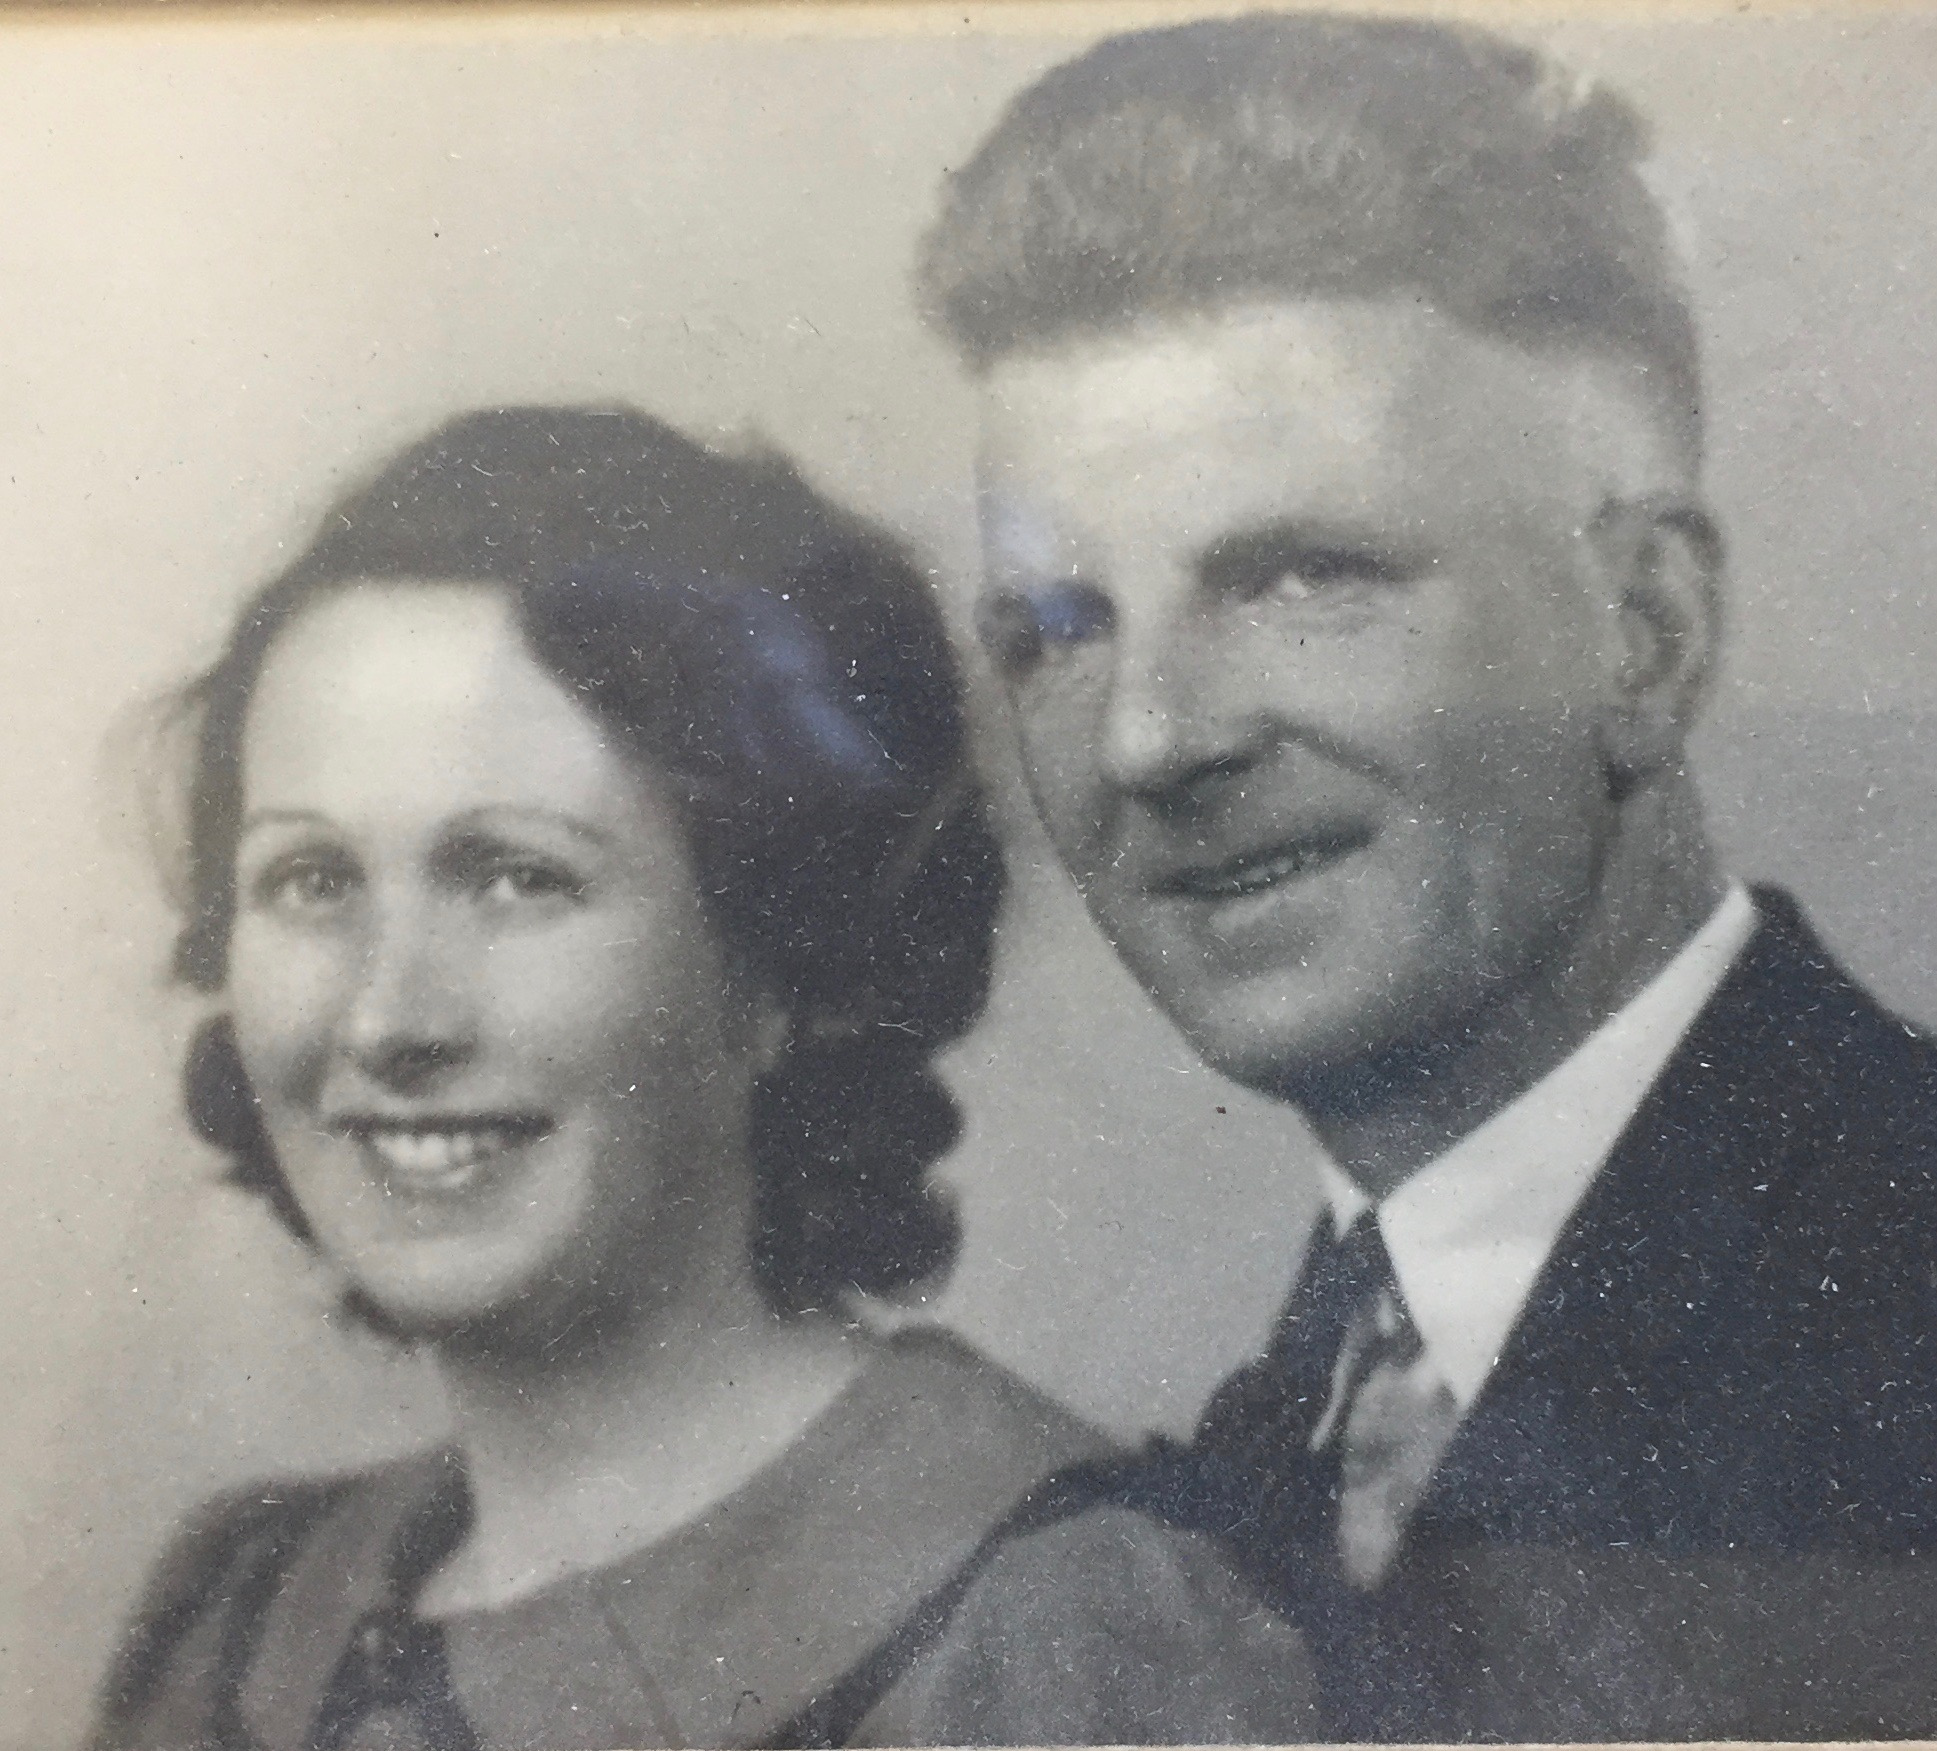 Photo from Harris family album